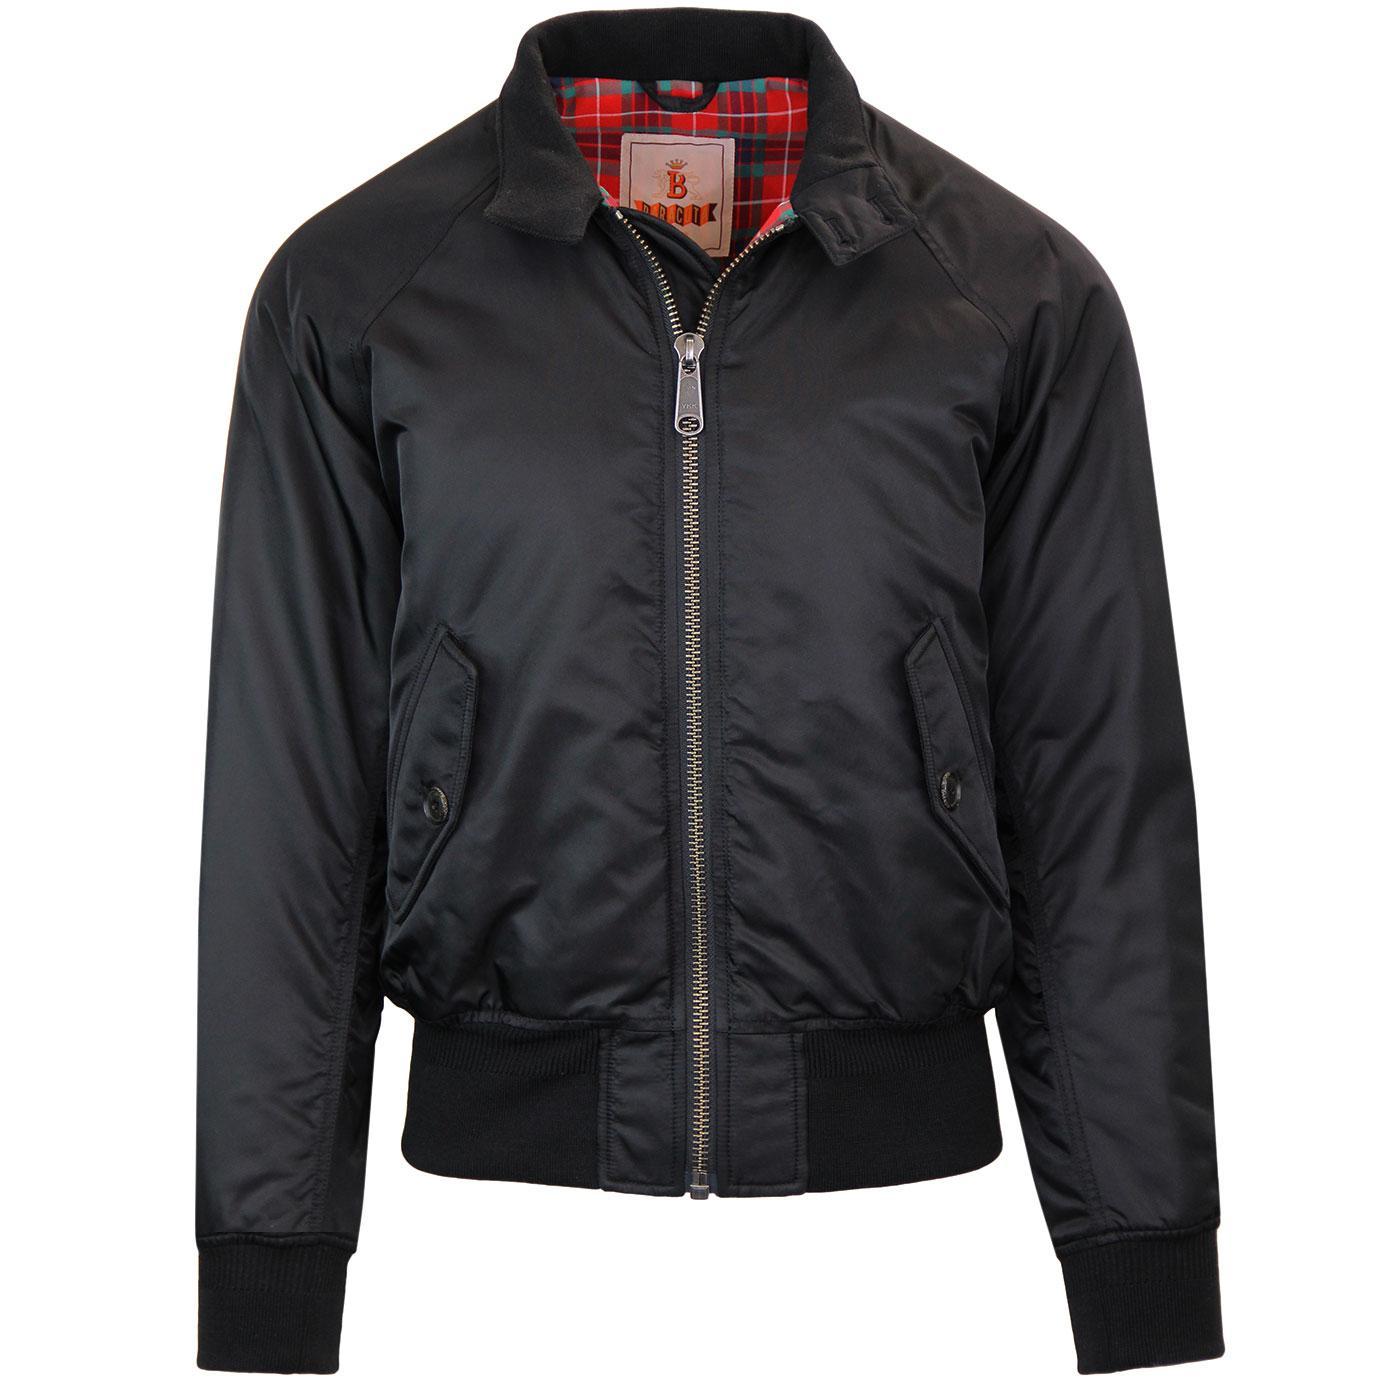 BARACUTA G9 Winter Flight Harrington Jacket BLACK